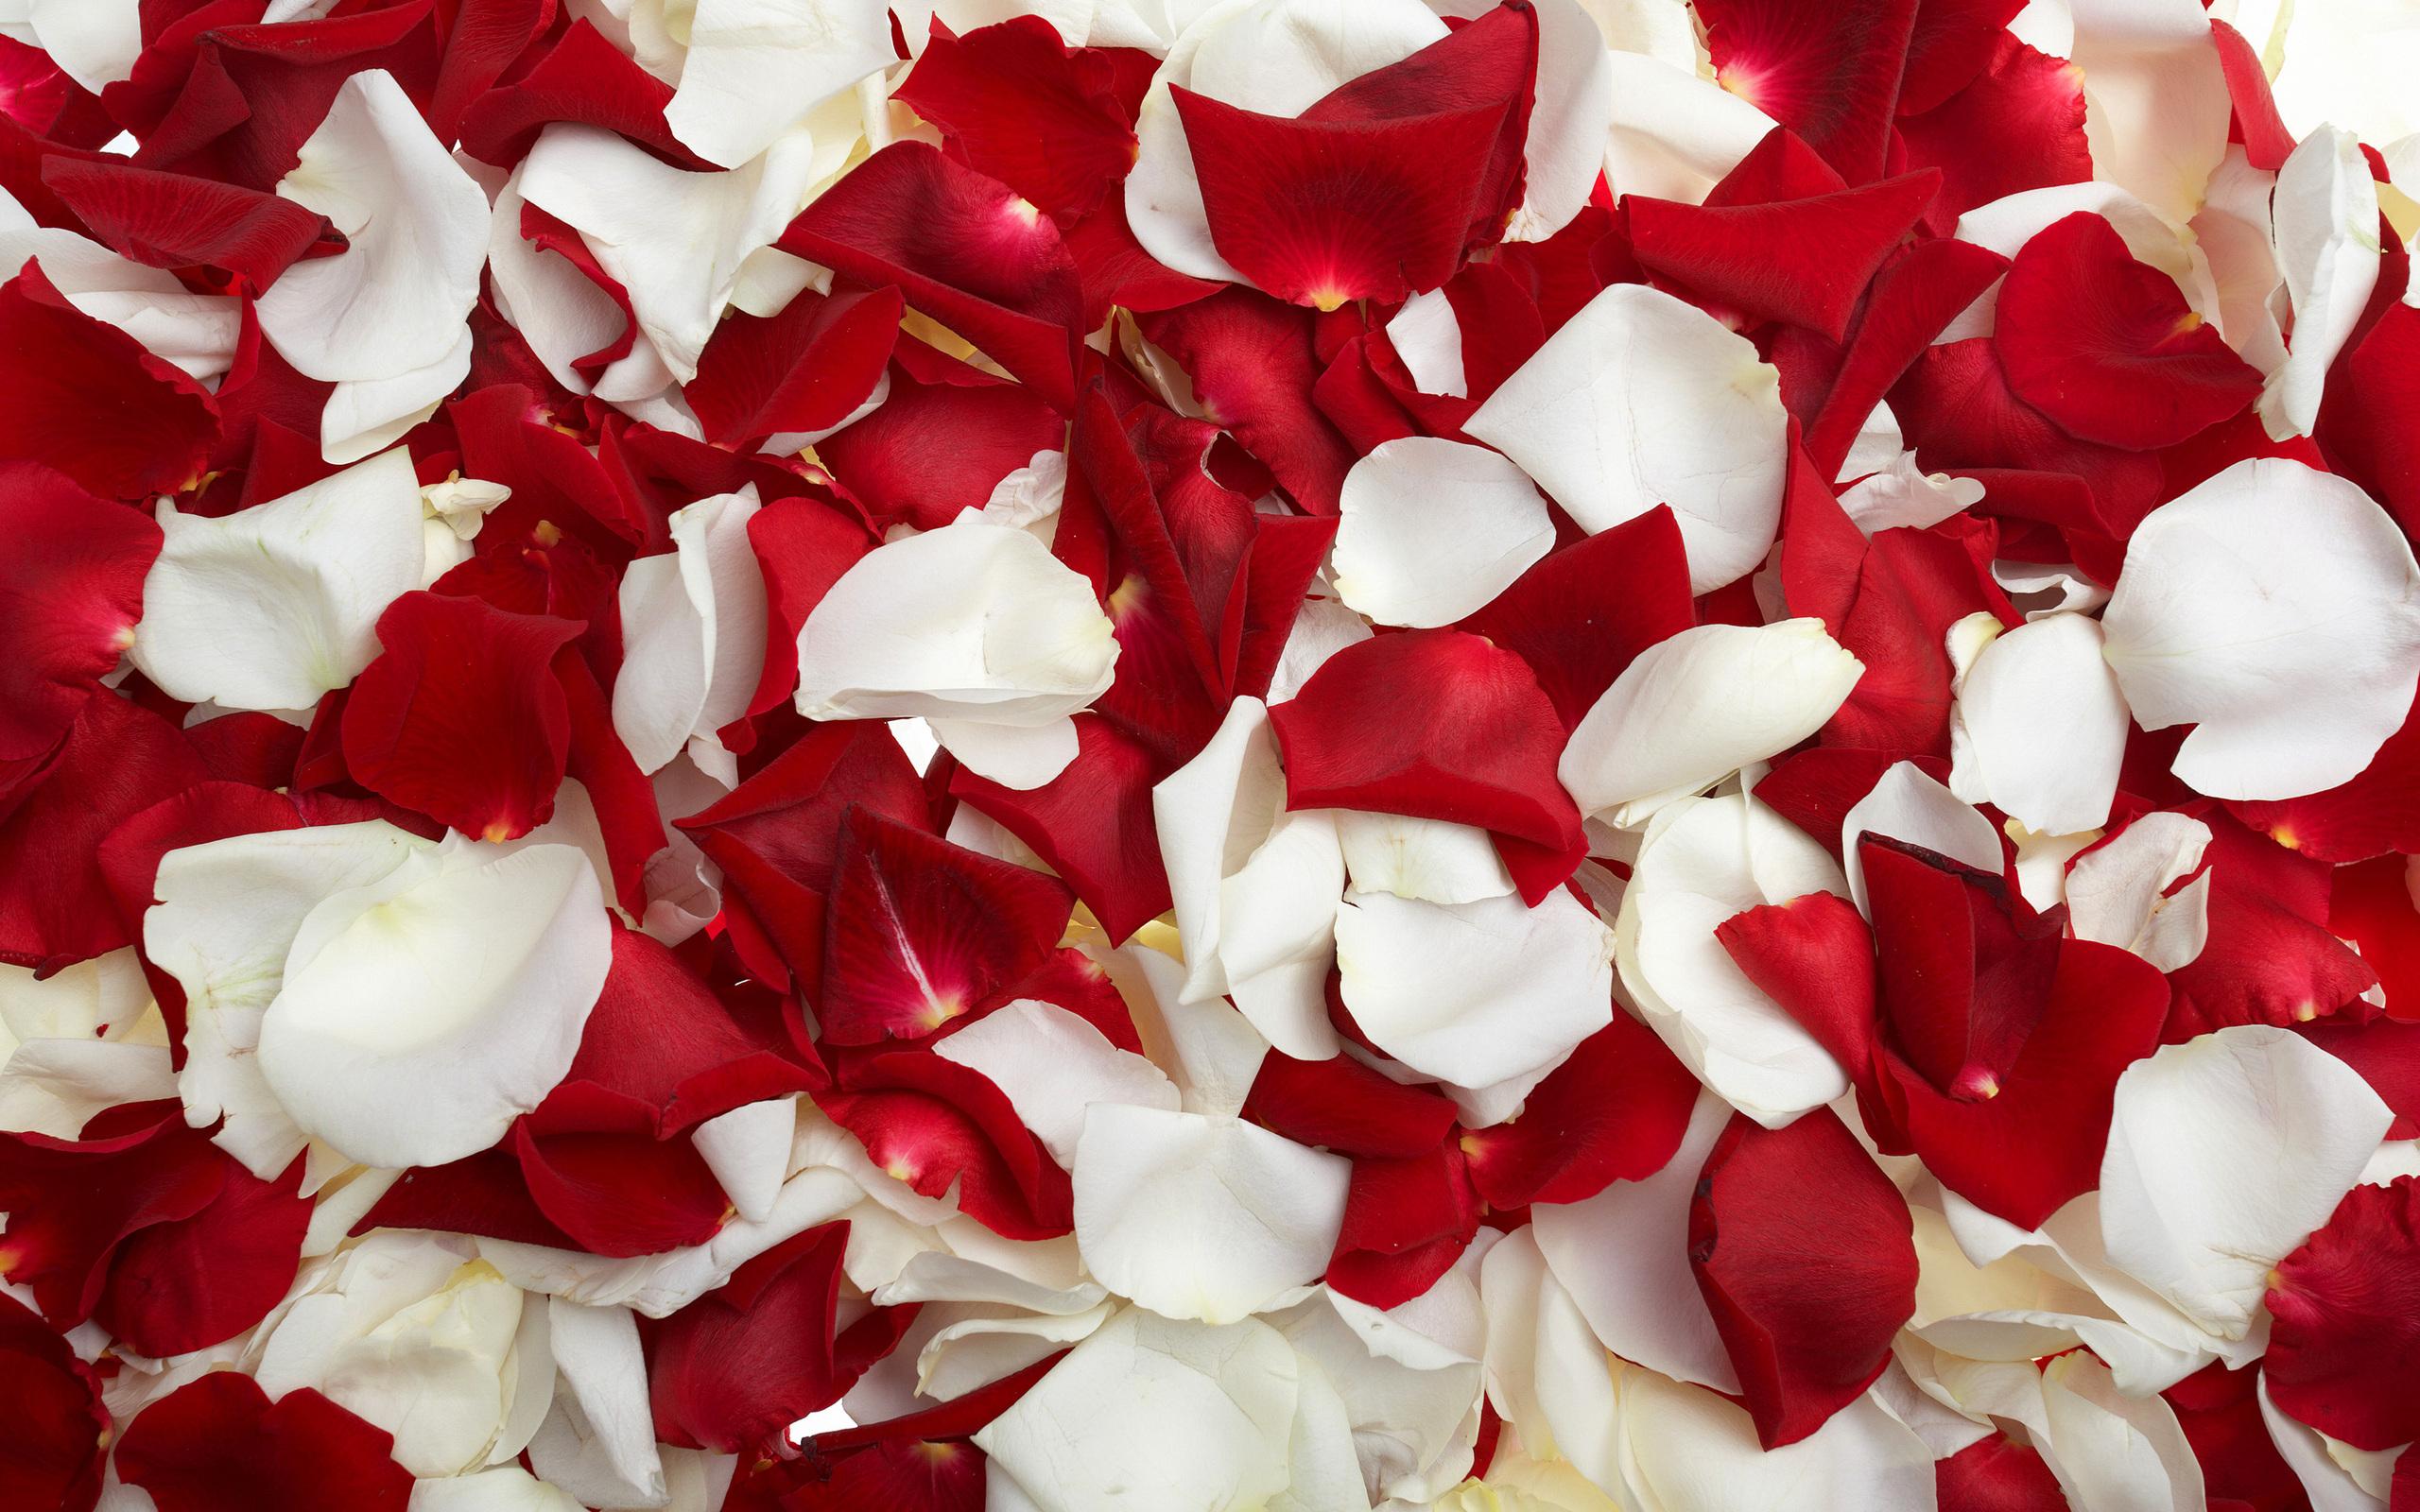 flower petal wallpapers